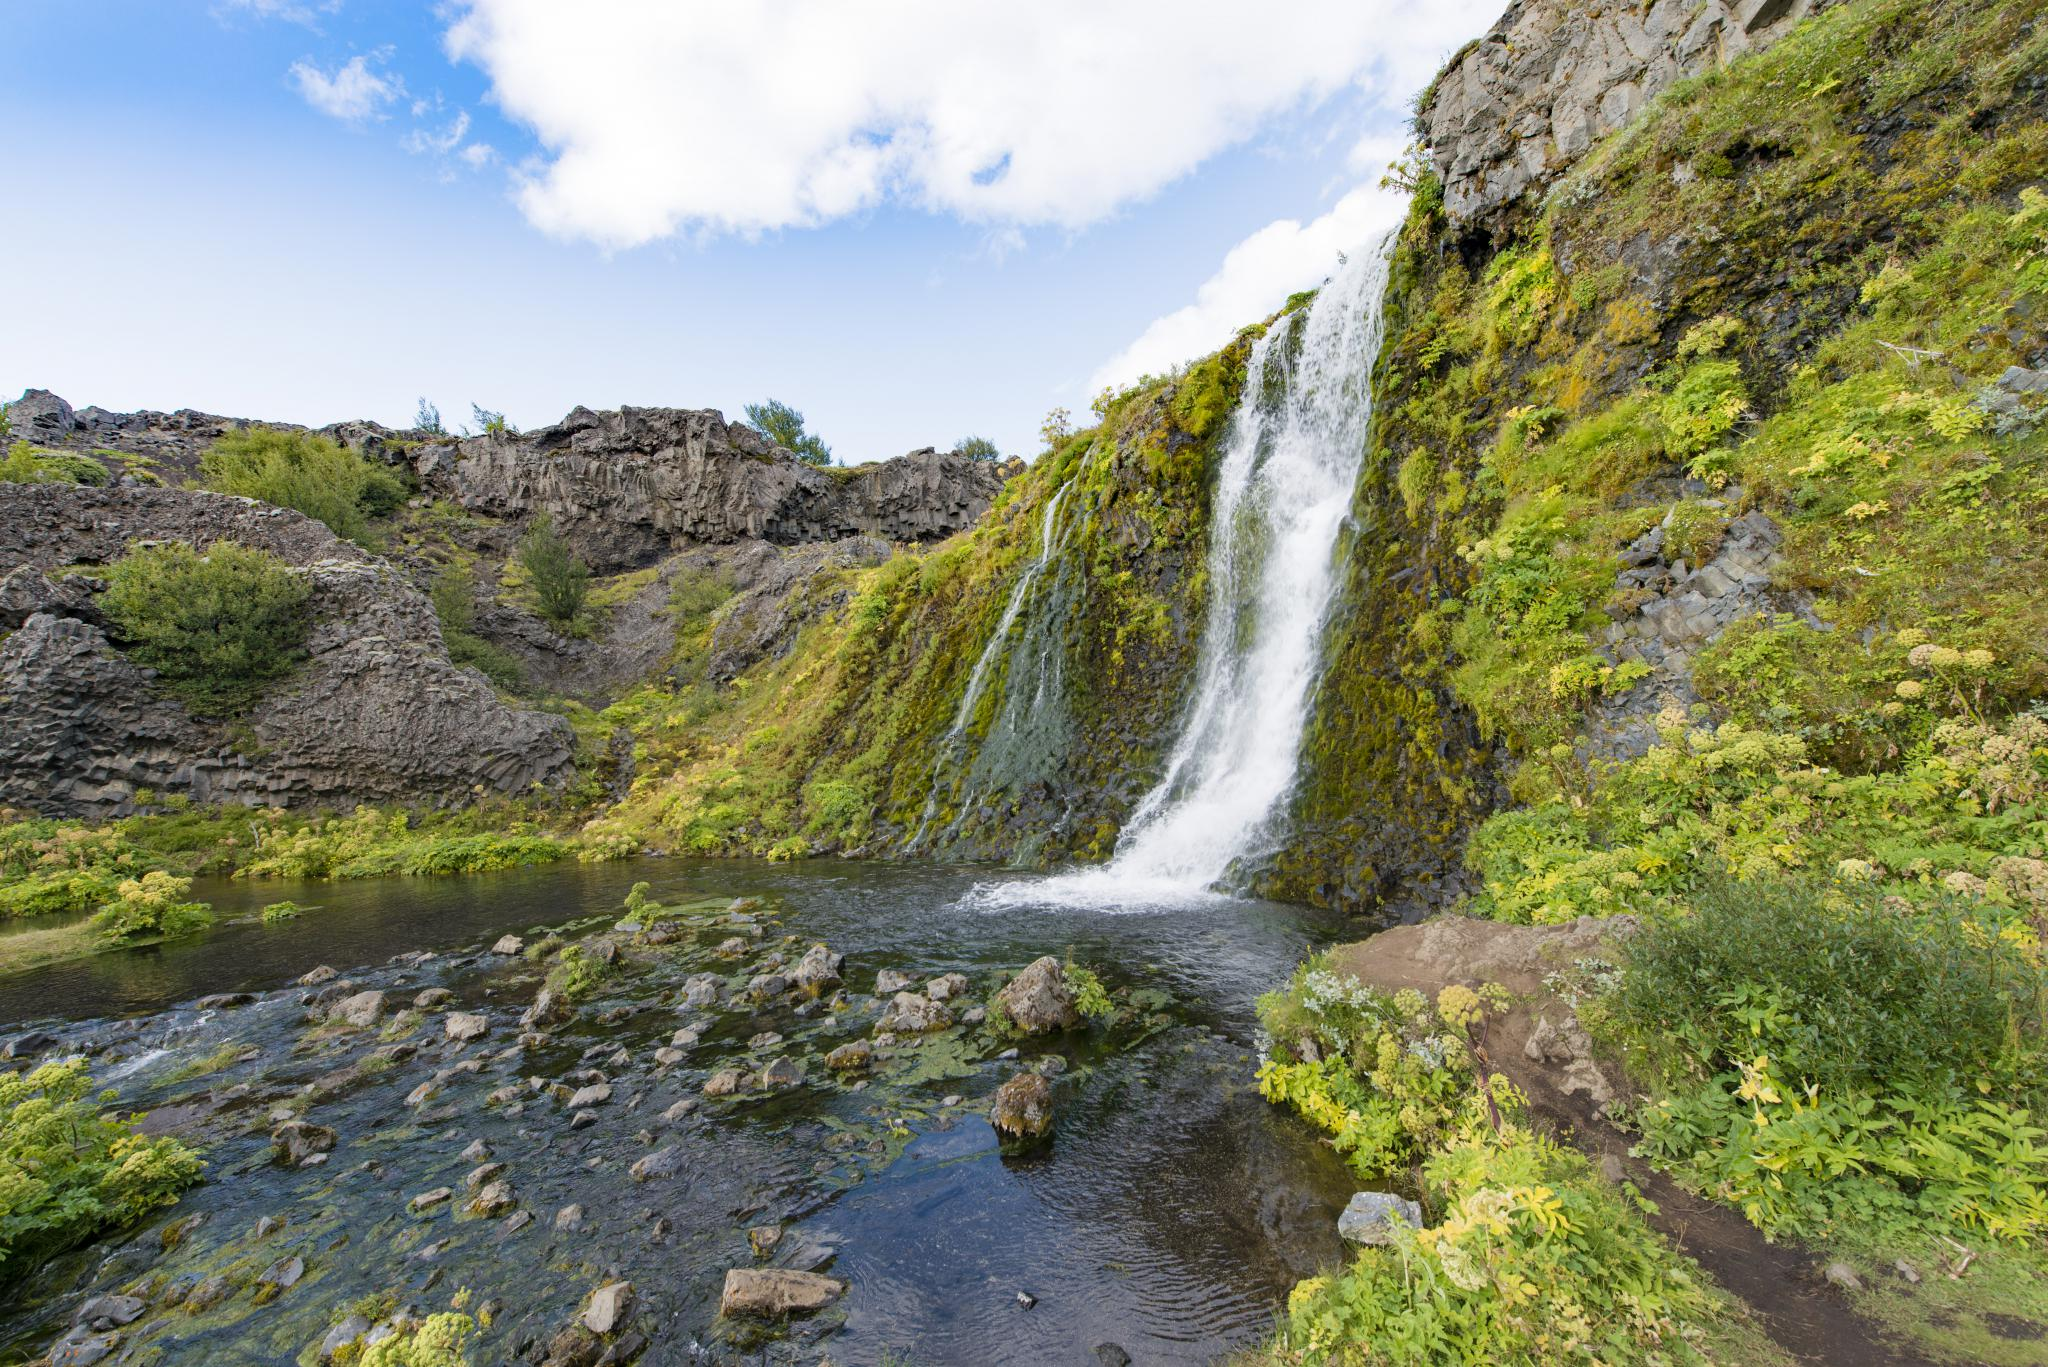 Þjórsárdalur Valley, Gjáin, Iceland, seen during the summer